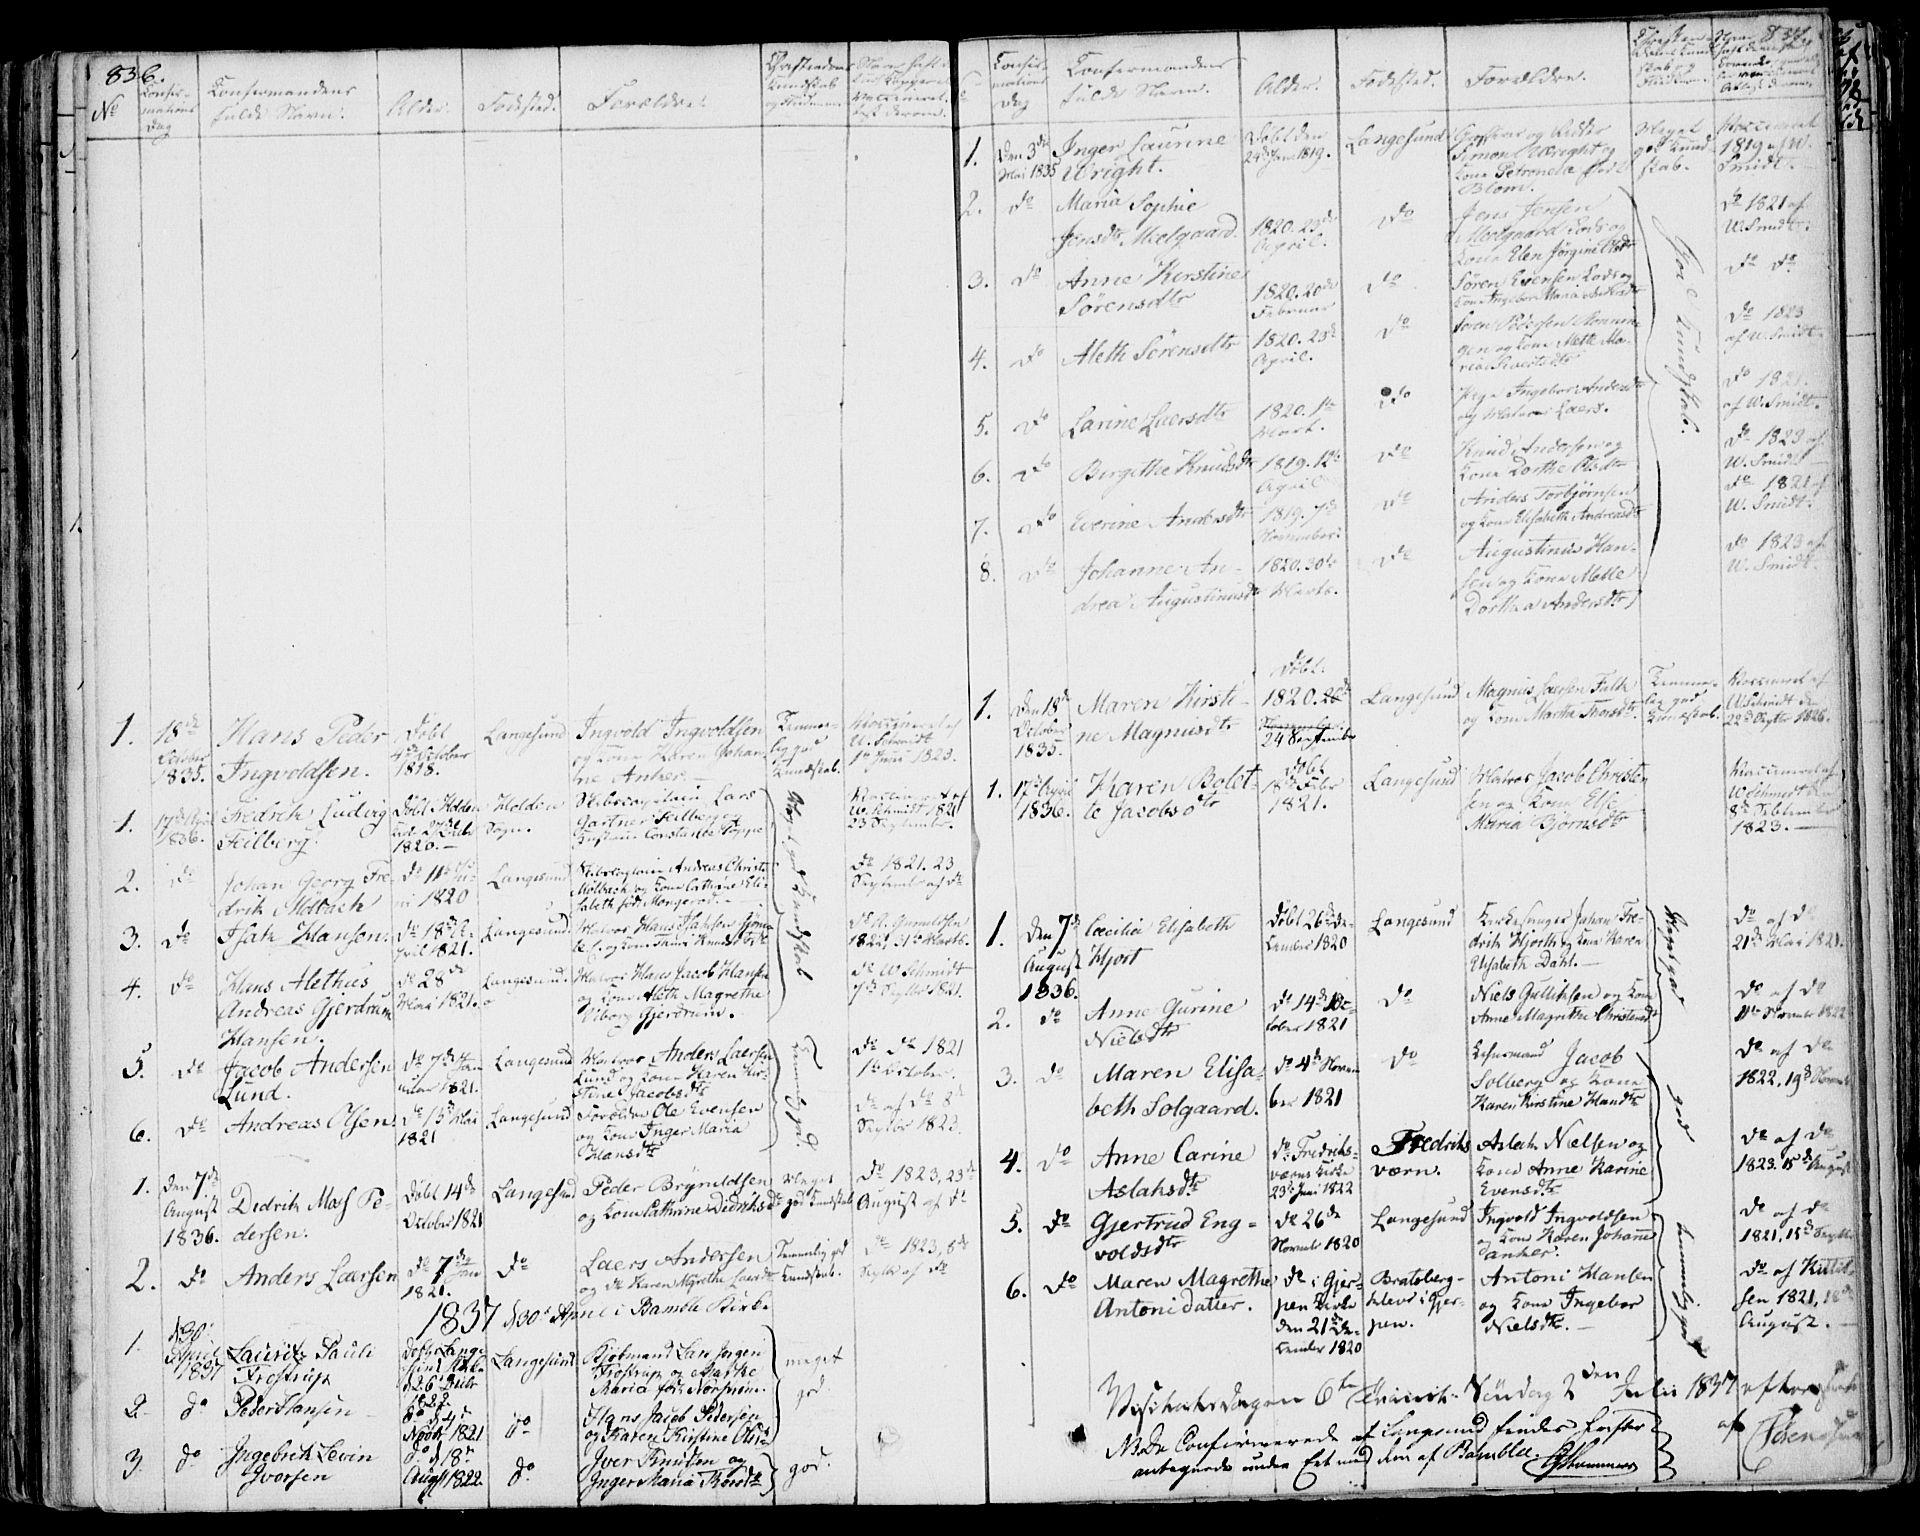 SAKO, Bamble kirkebøker, F/Fa/L0004: Ministerialbok nr. I 4, 1834-1853, s. 836-837